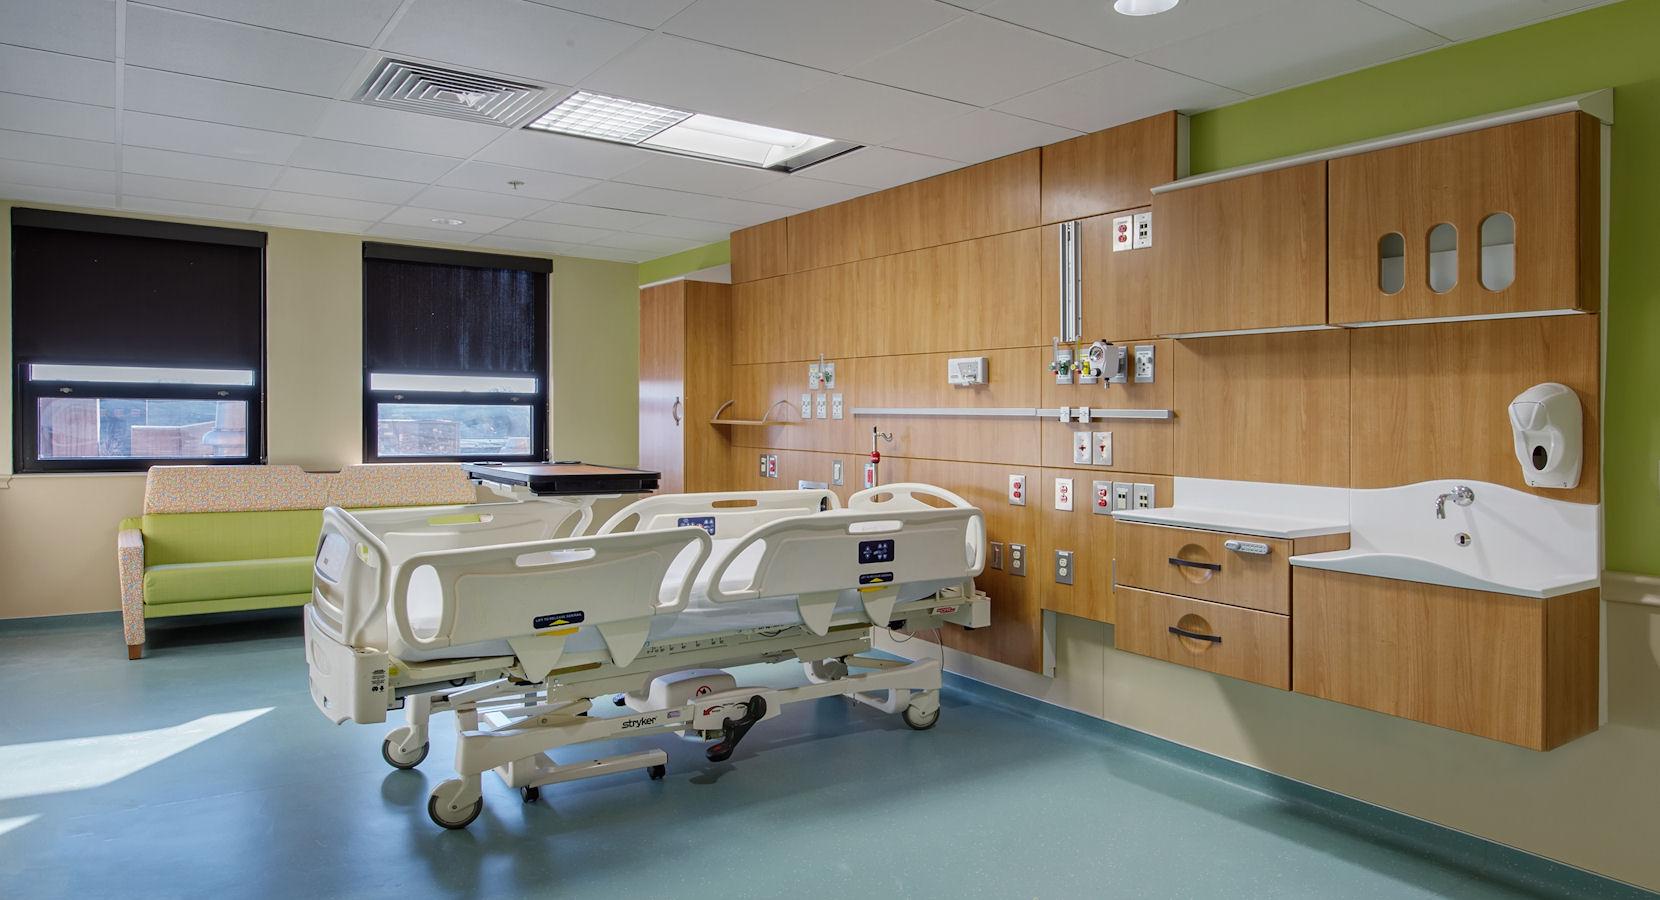 healthcare-slider-03-1660x900